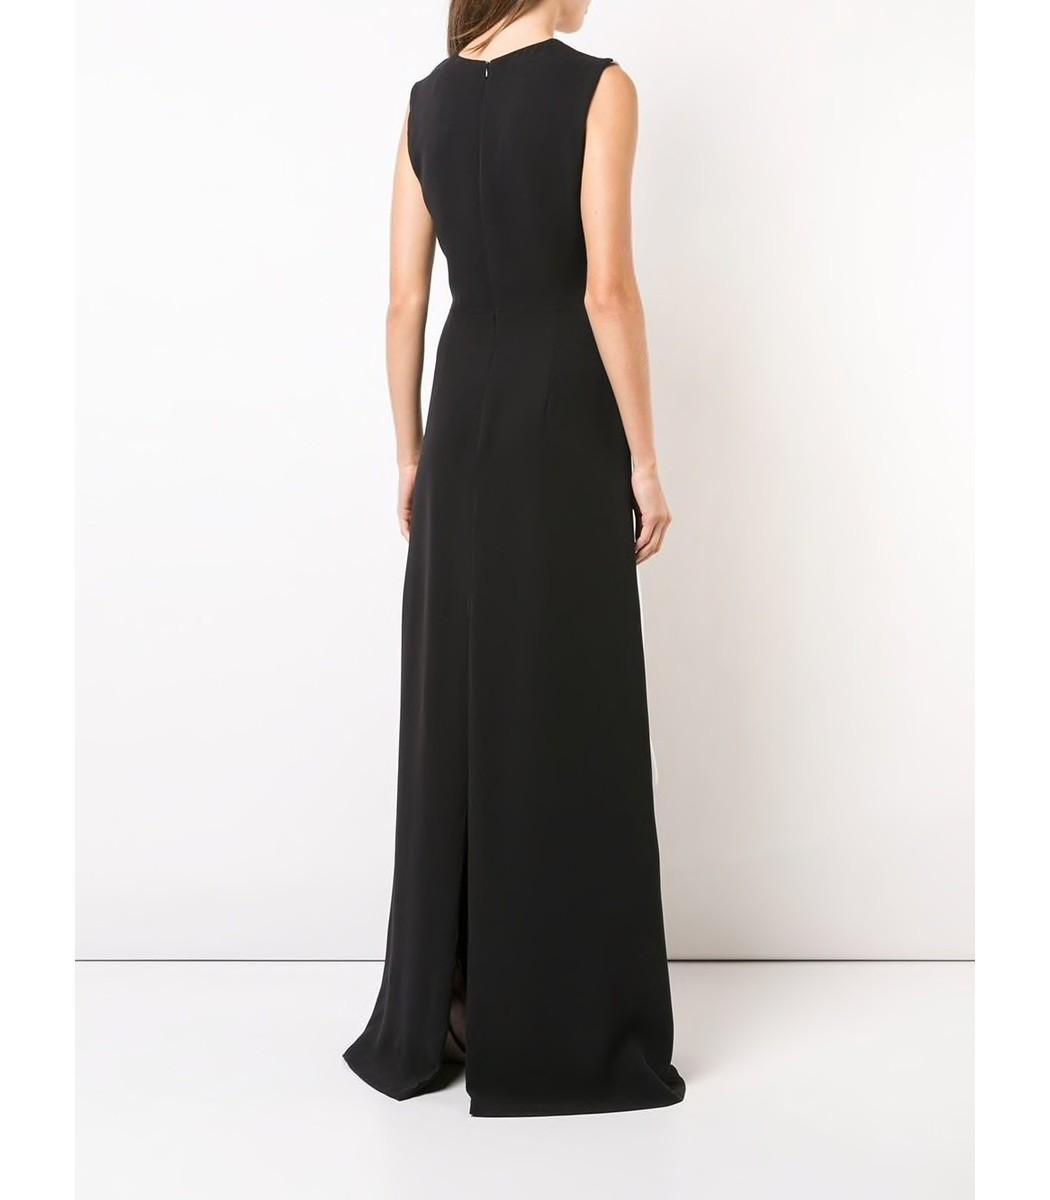 Carolina Herrera Paneled Gown - Black & White Silk Gown